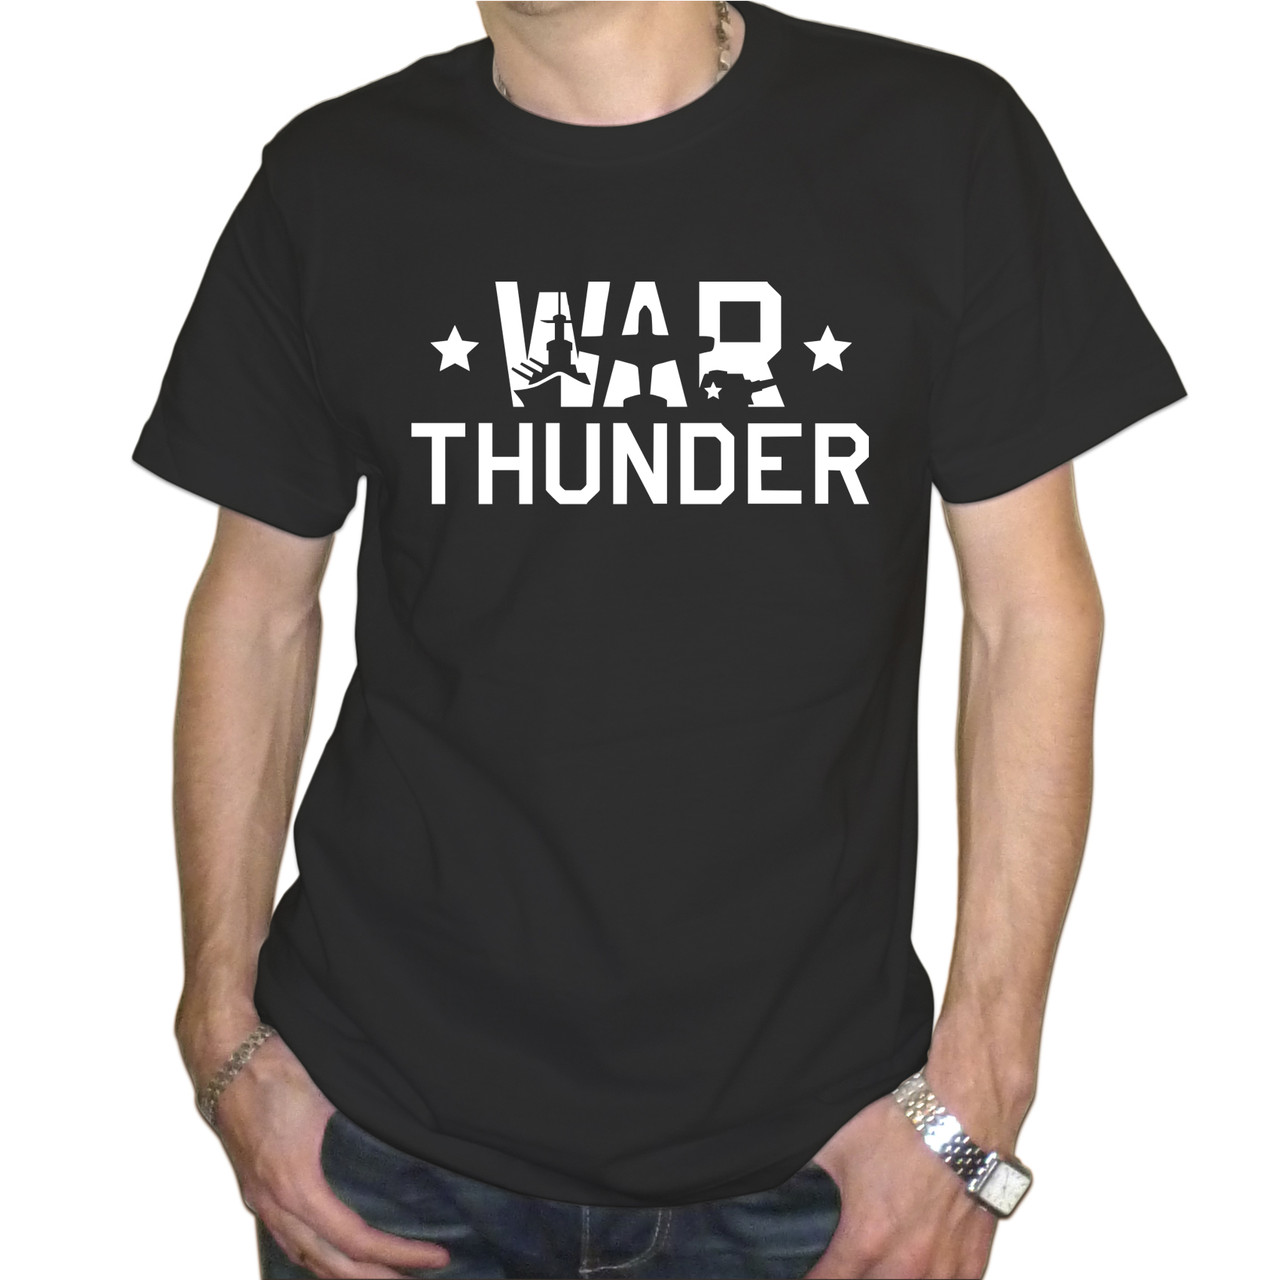 war thunder футболки купить